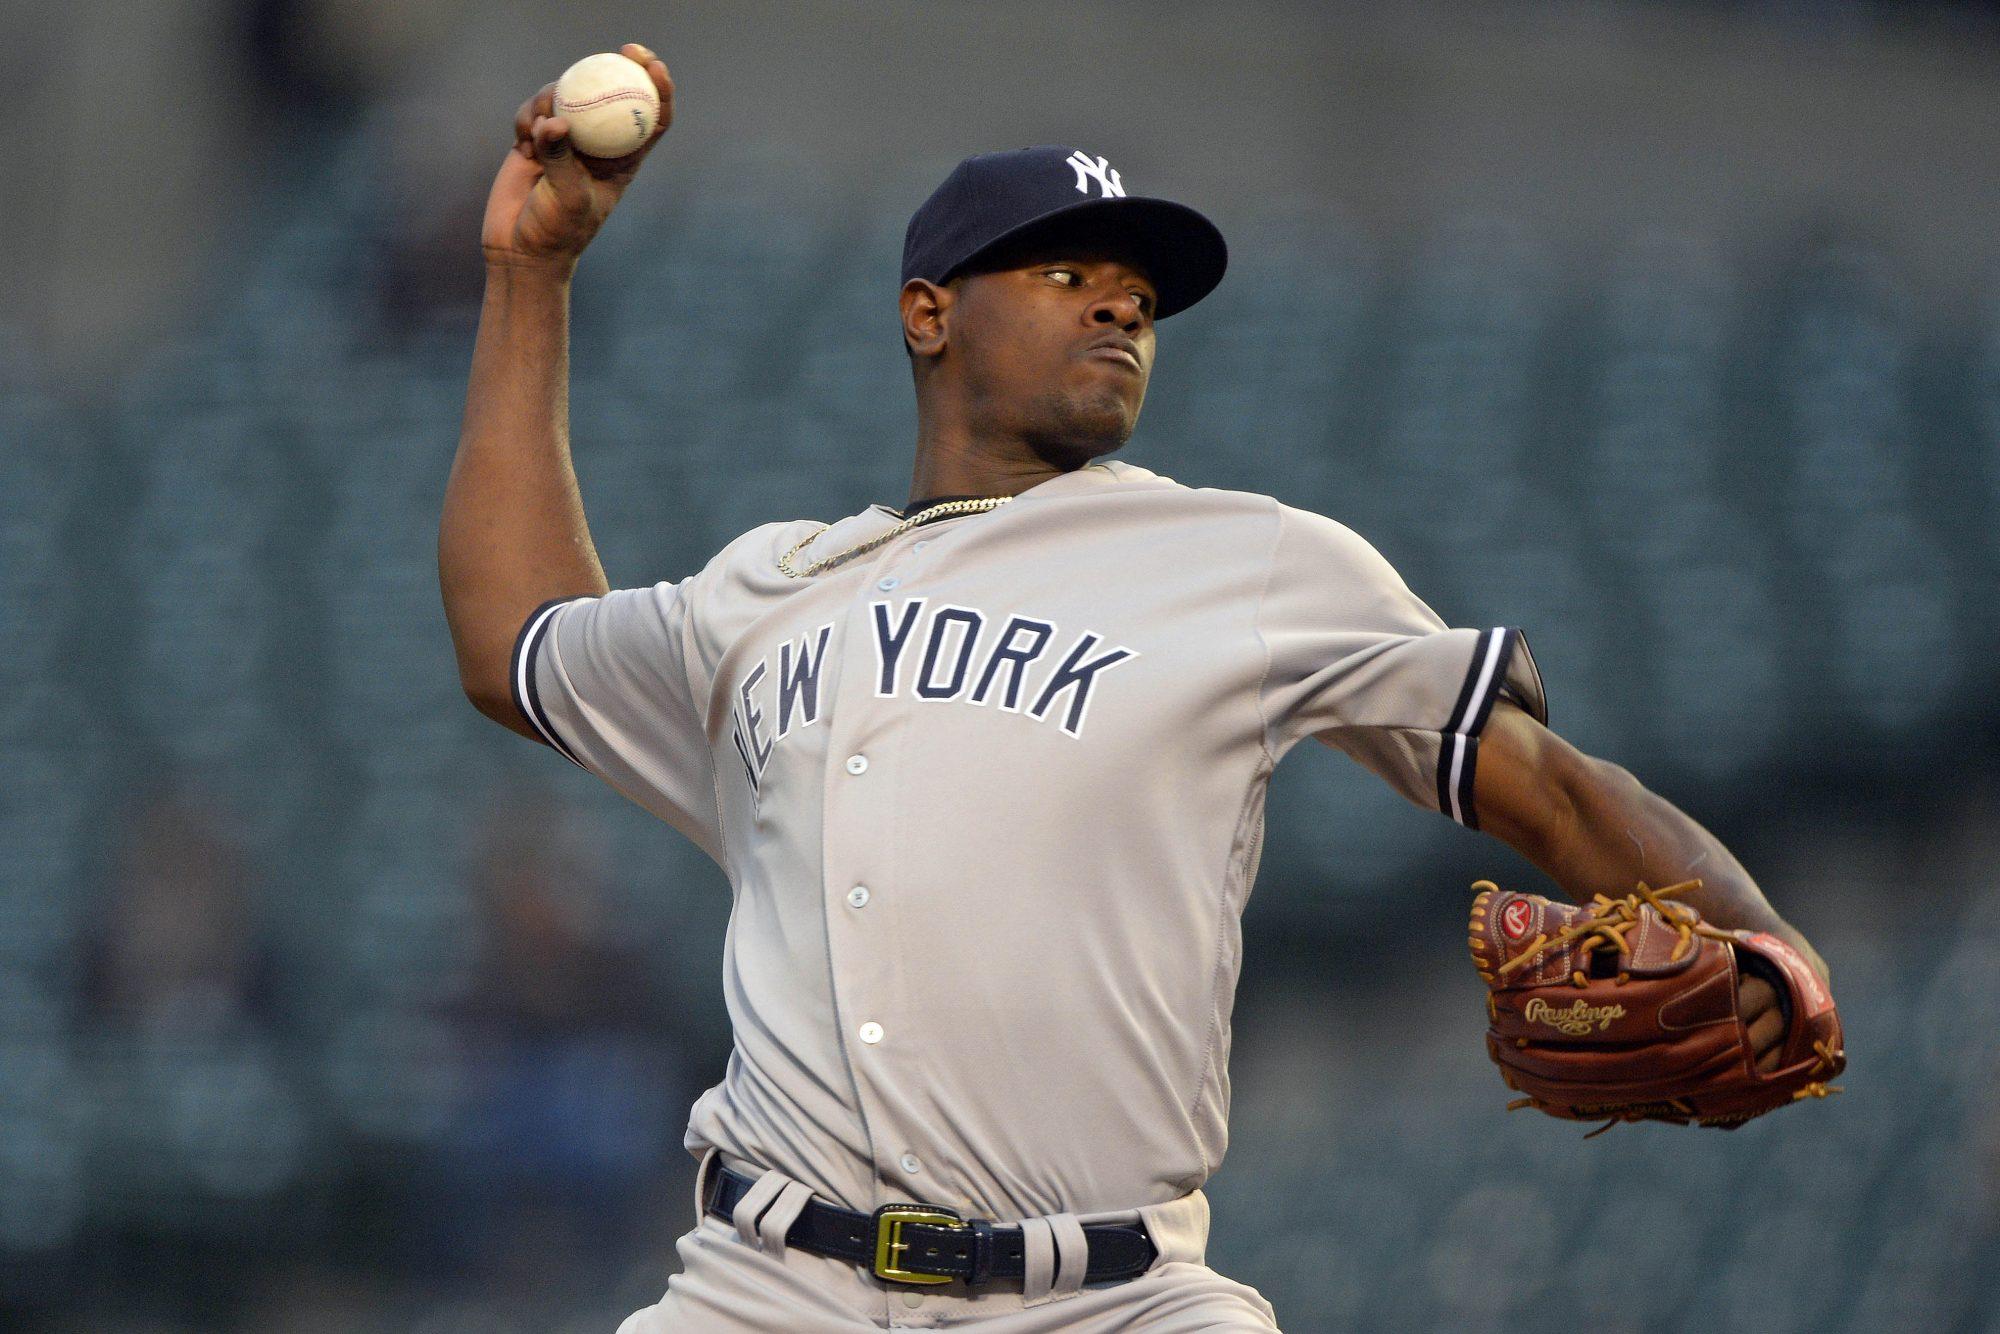 New York Yankees, Baltimore Orioles Set To Clash In Weekend Series